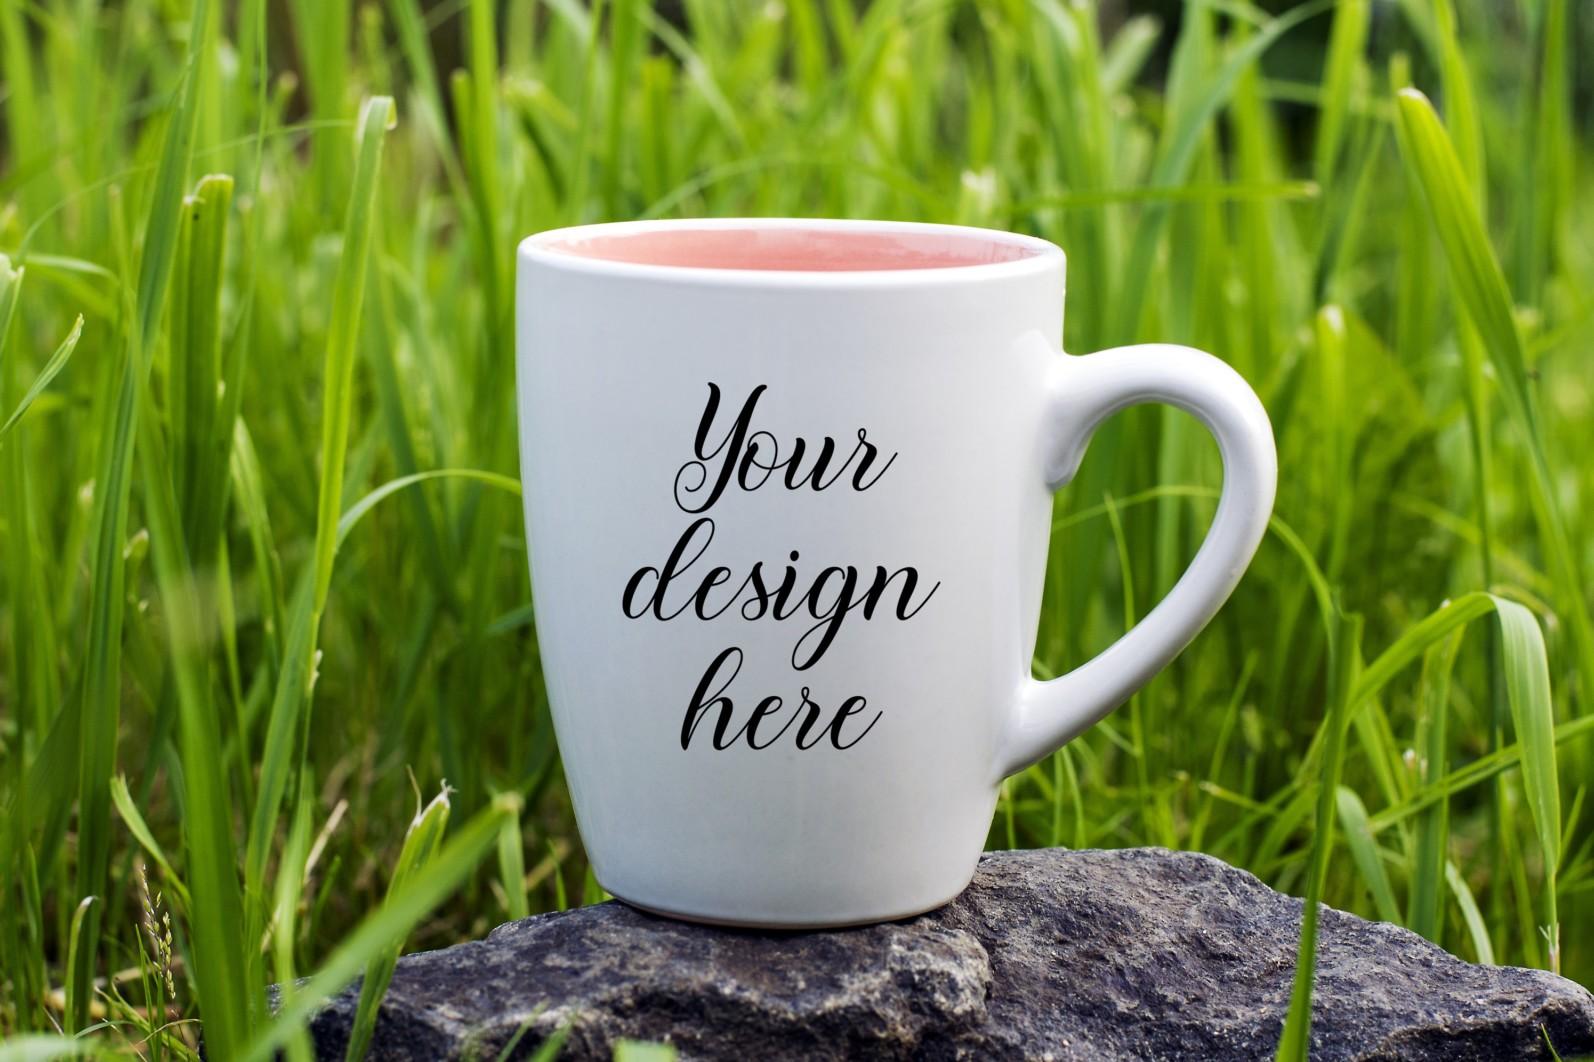 Coffee mug mockup bundle. Mug template bundle. PSD, JPEG files. - 1 1 4 scaled -